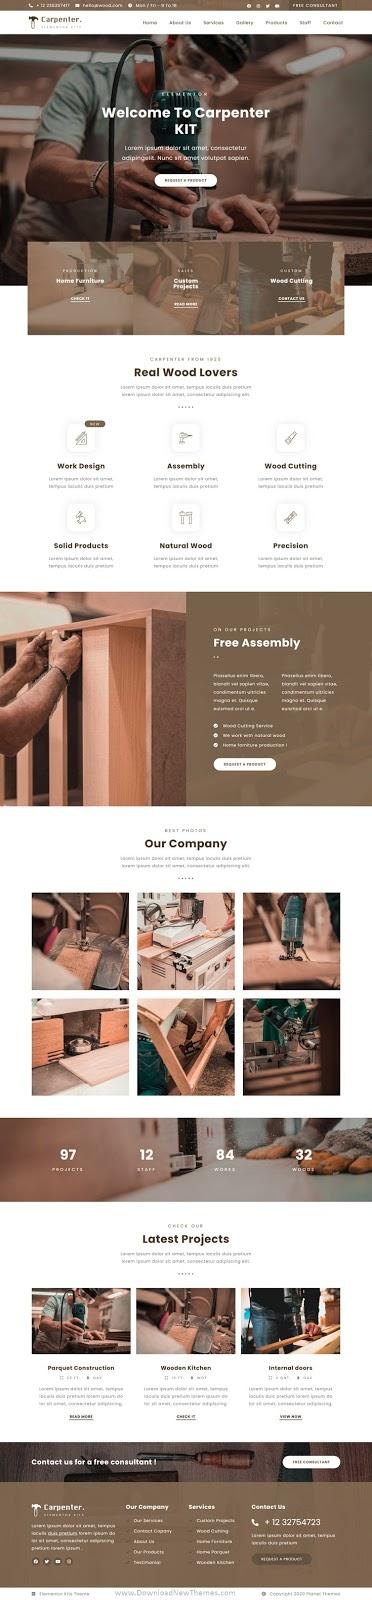 Carpenter Template Kit